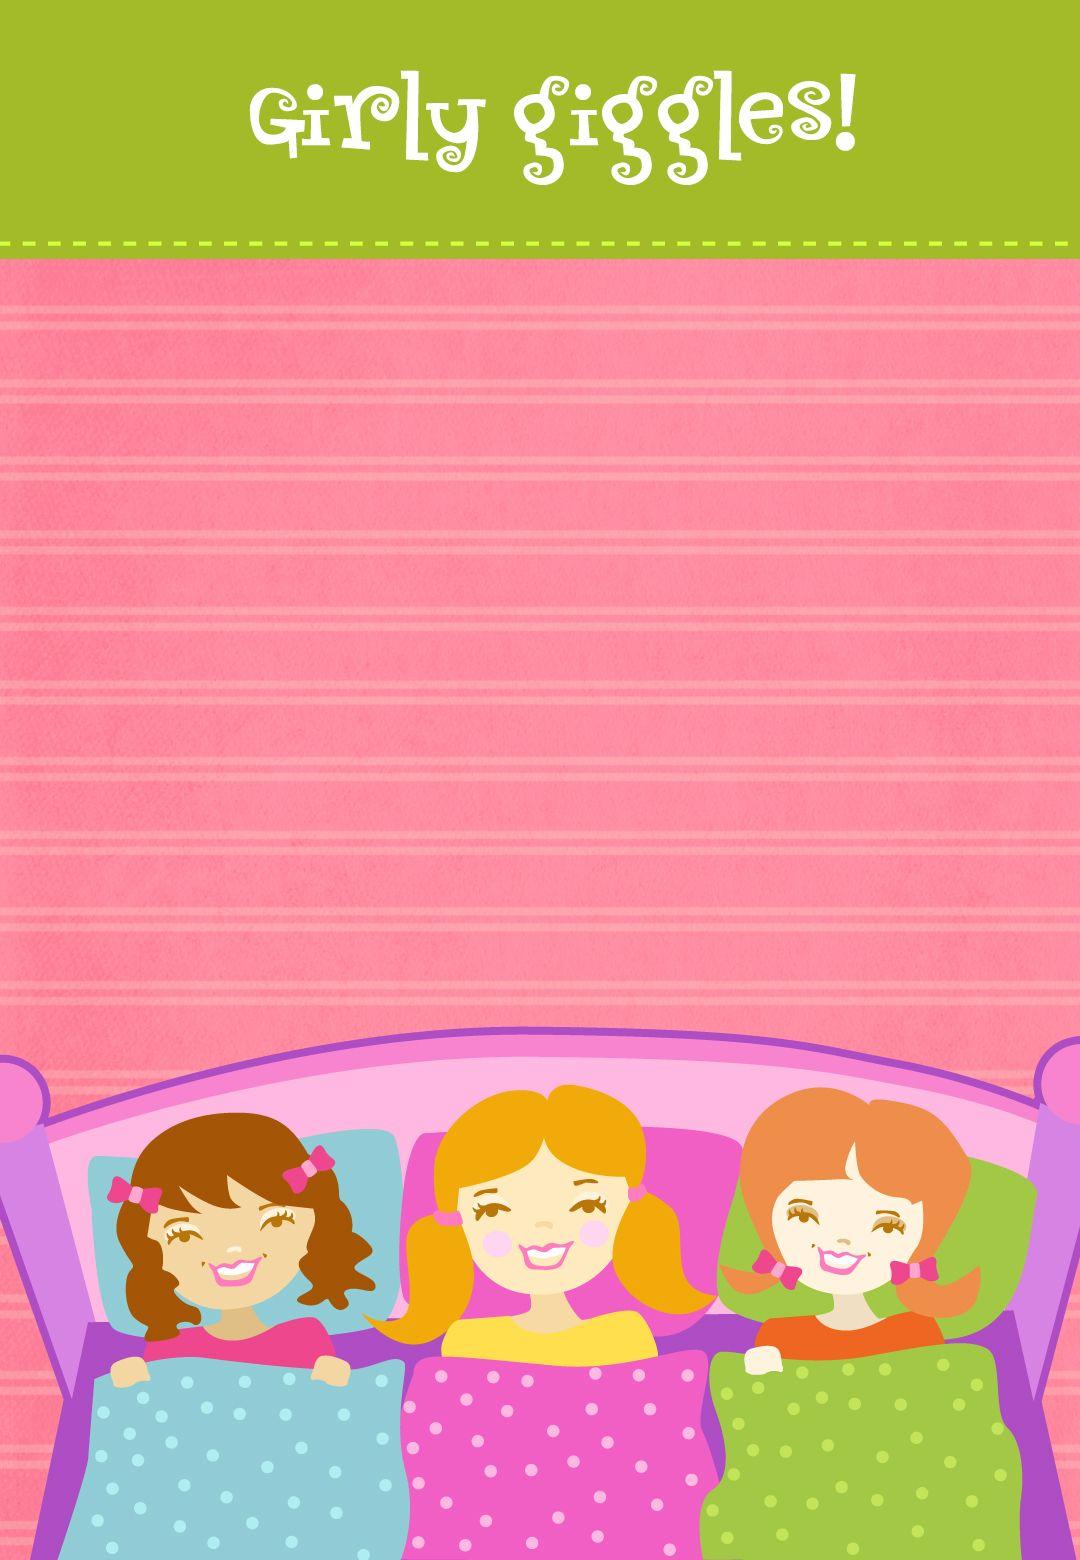 Free Printable Girly Giggles Invitation | 11111 | Pinterest | Free ...